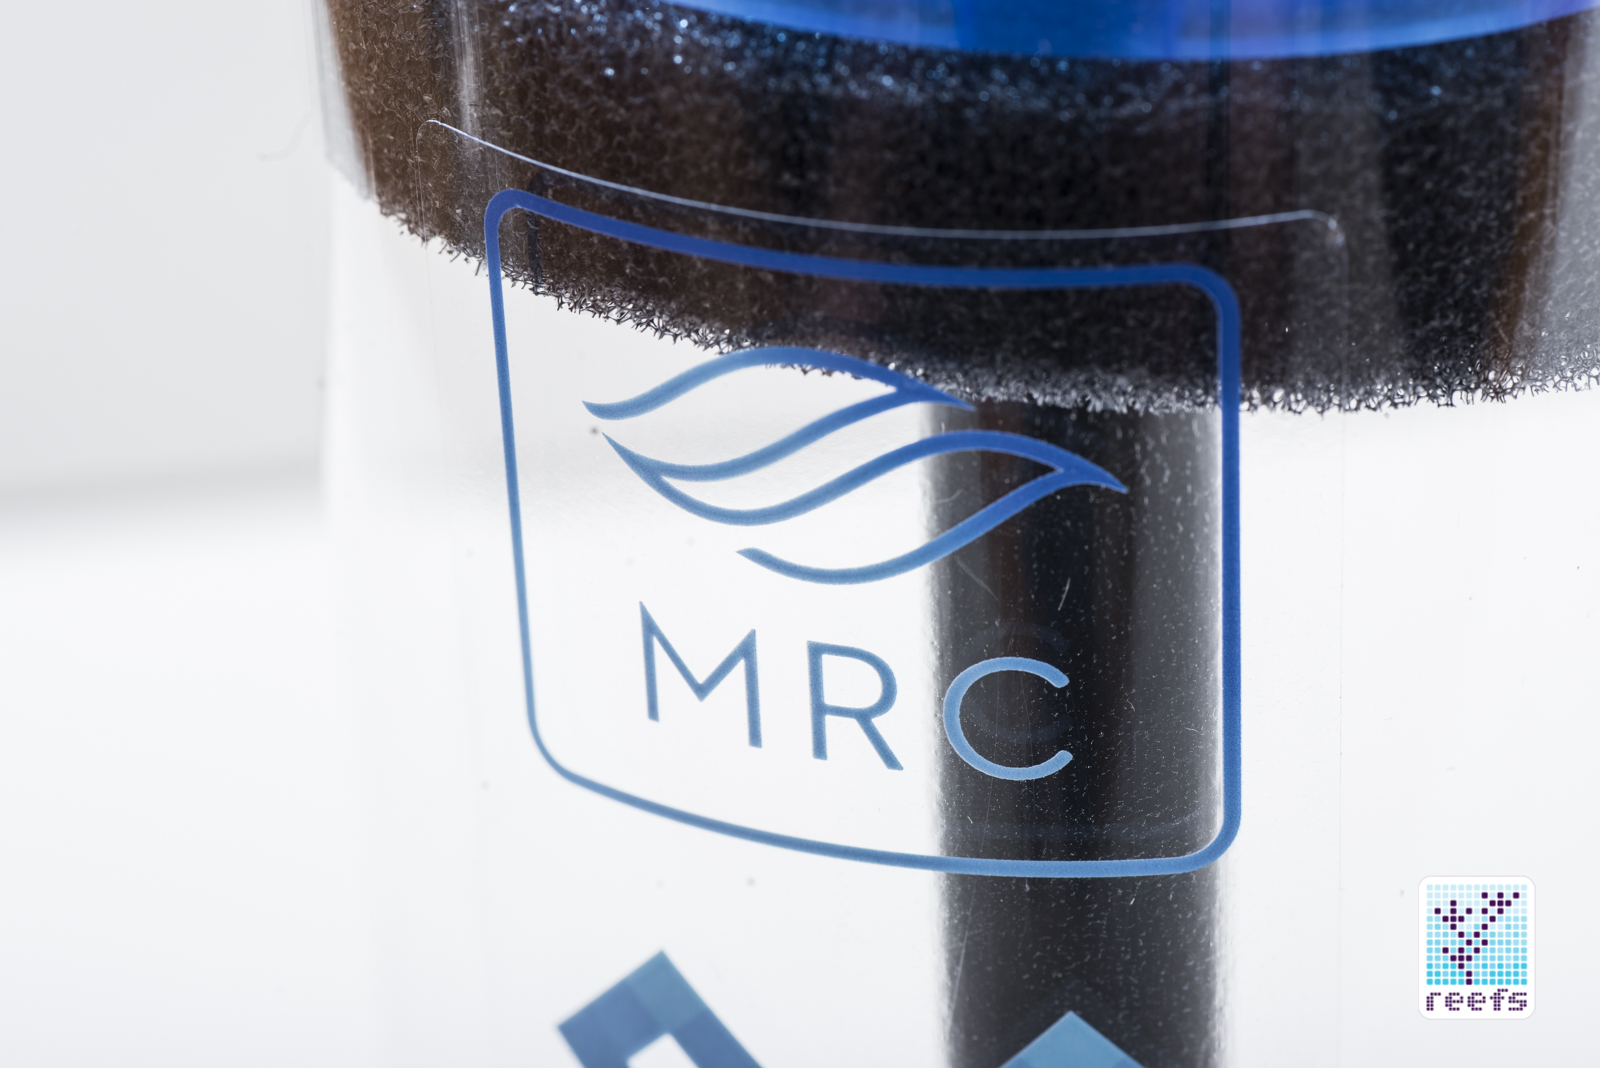 mrc x3 reactor (28 of 35)